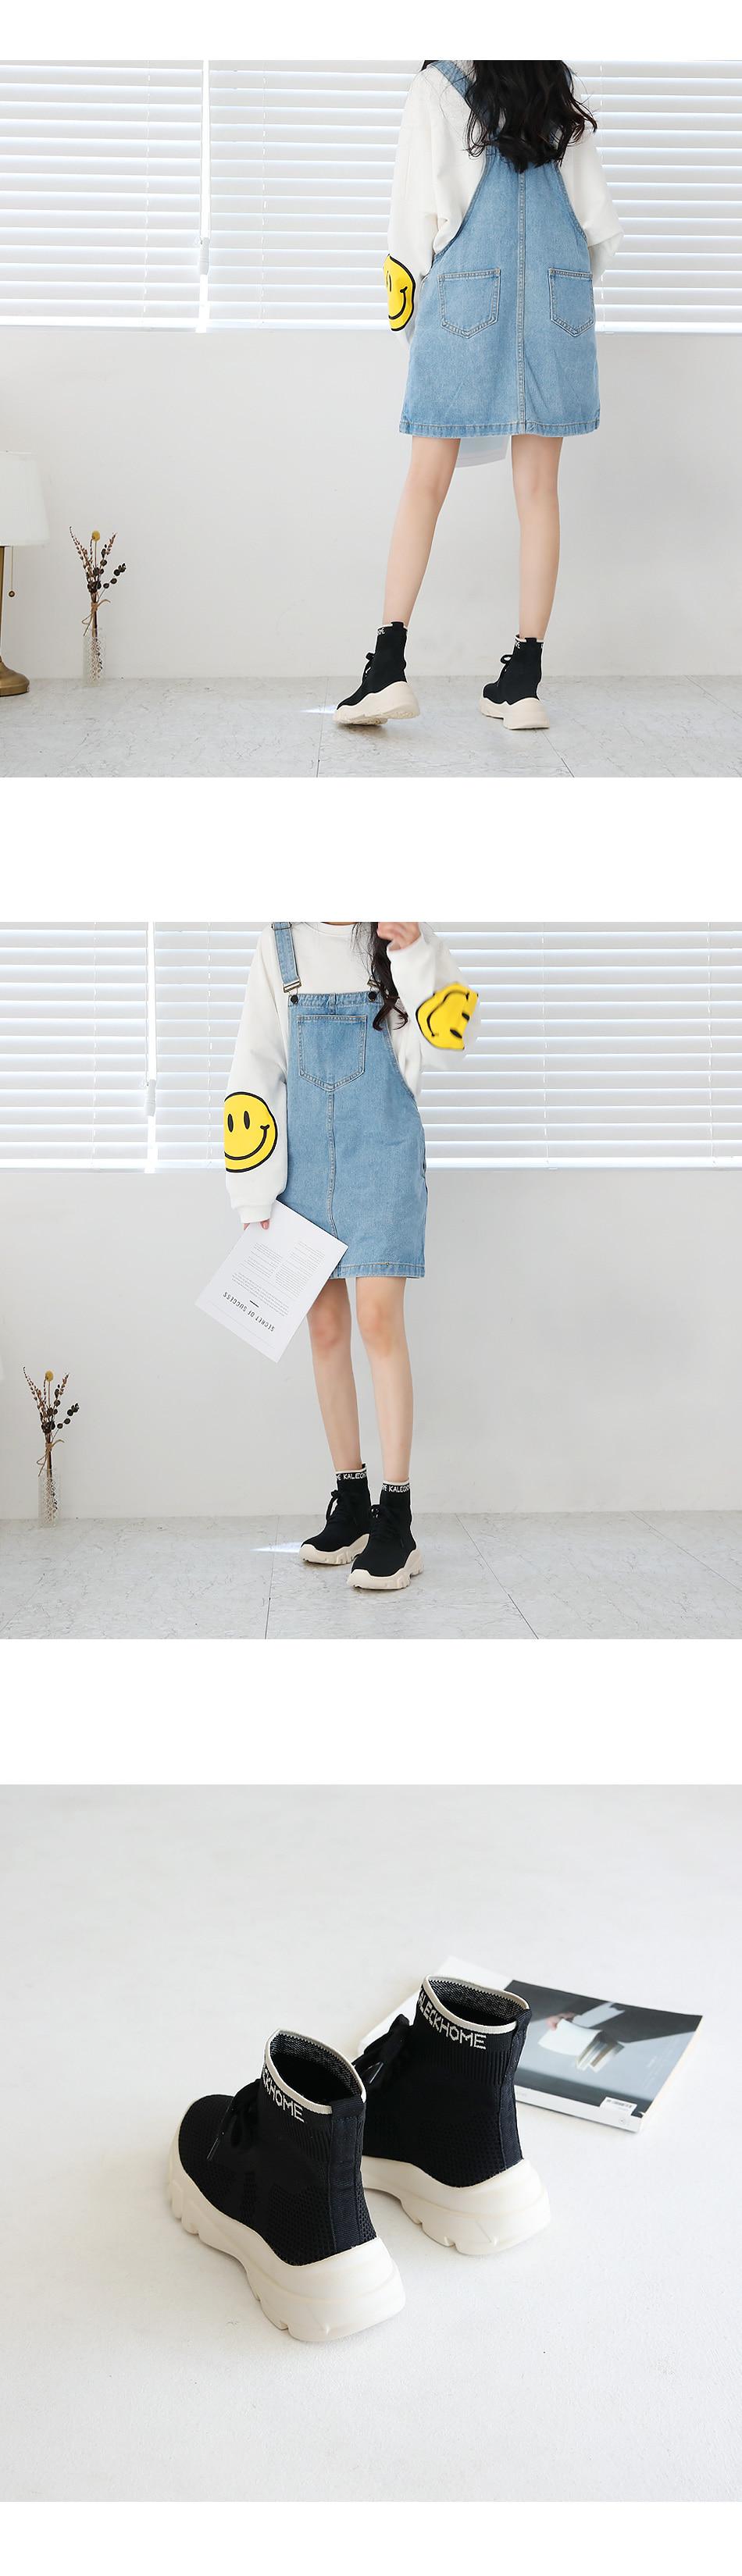 Shael Sox Sneakers 4cm